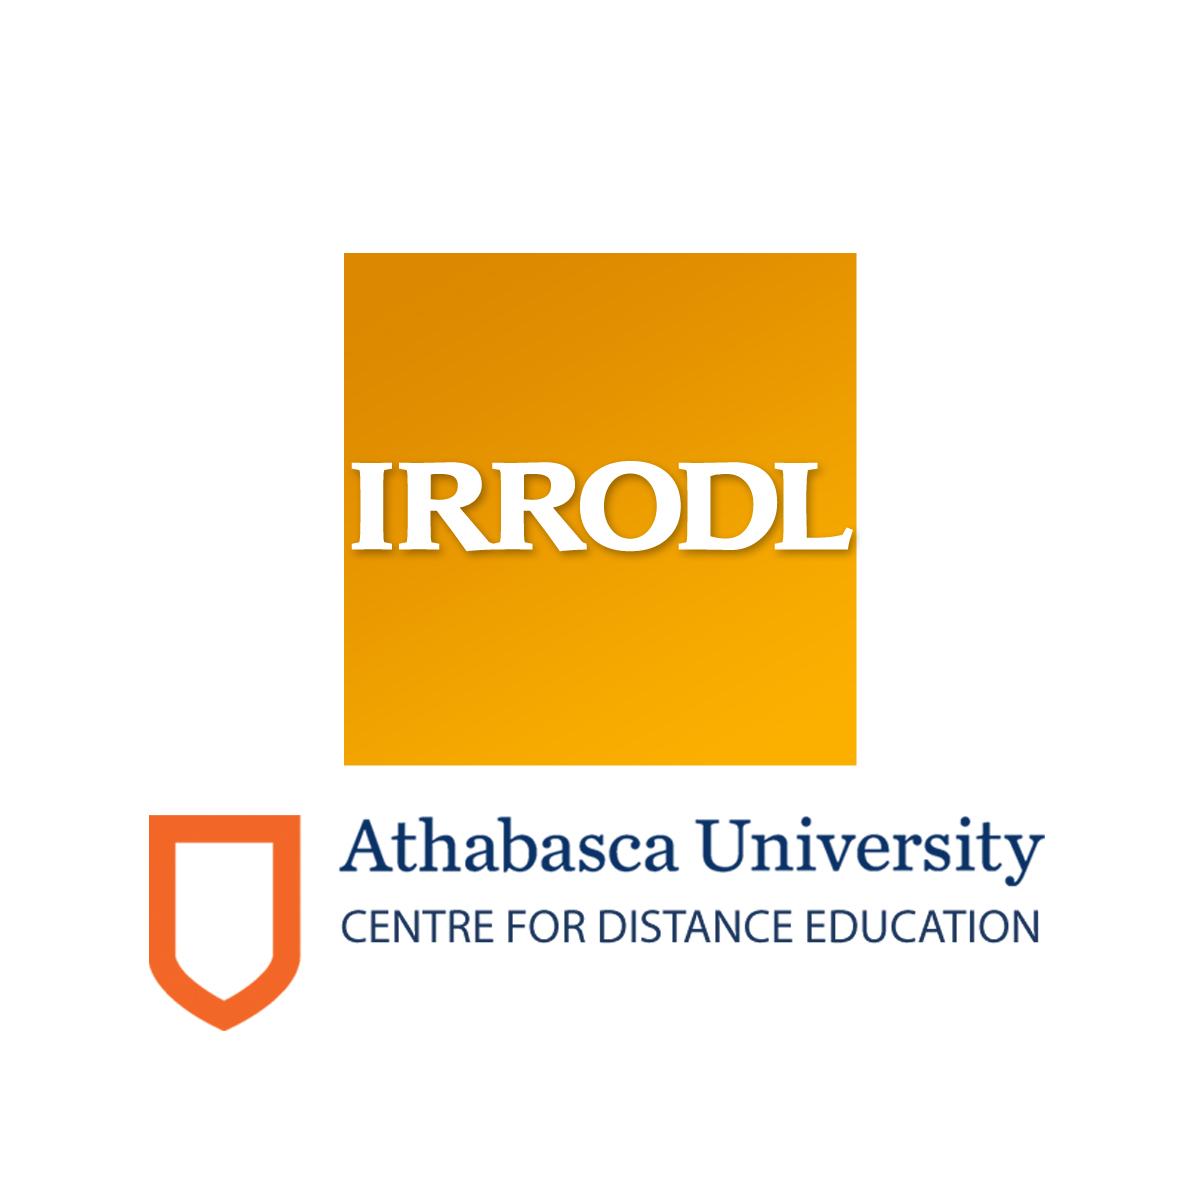 IRRODL AU Logo